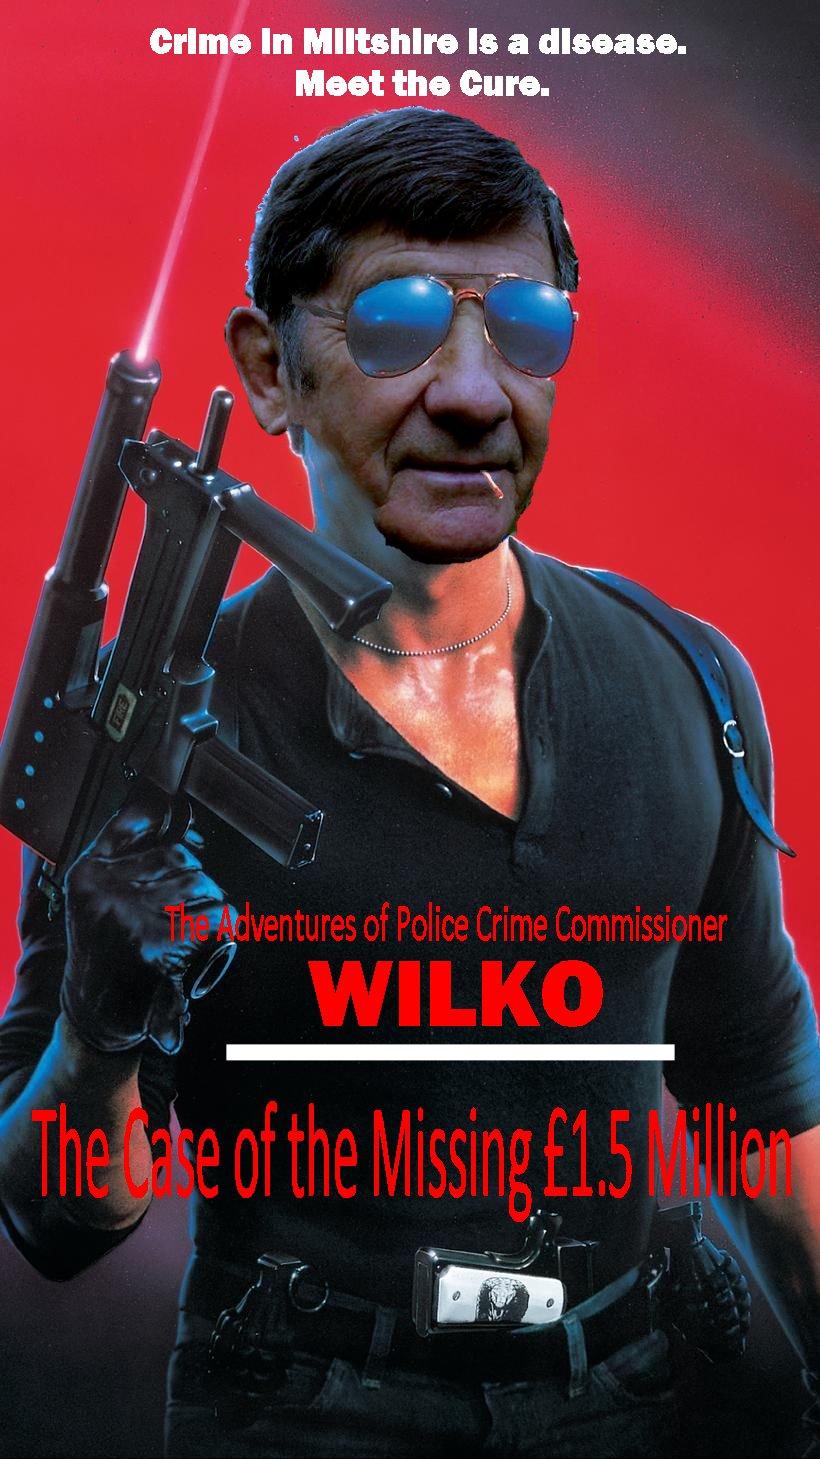 The Adventures of Police Crime CommissionerWilko